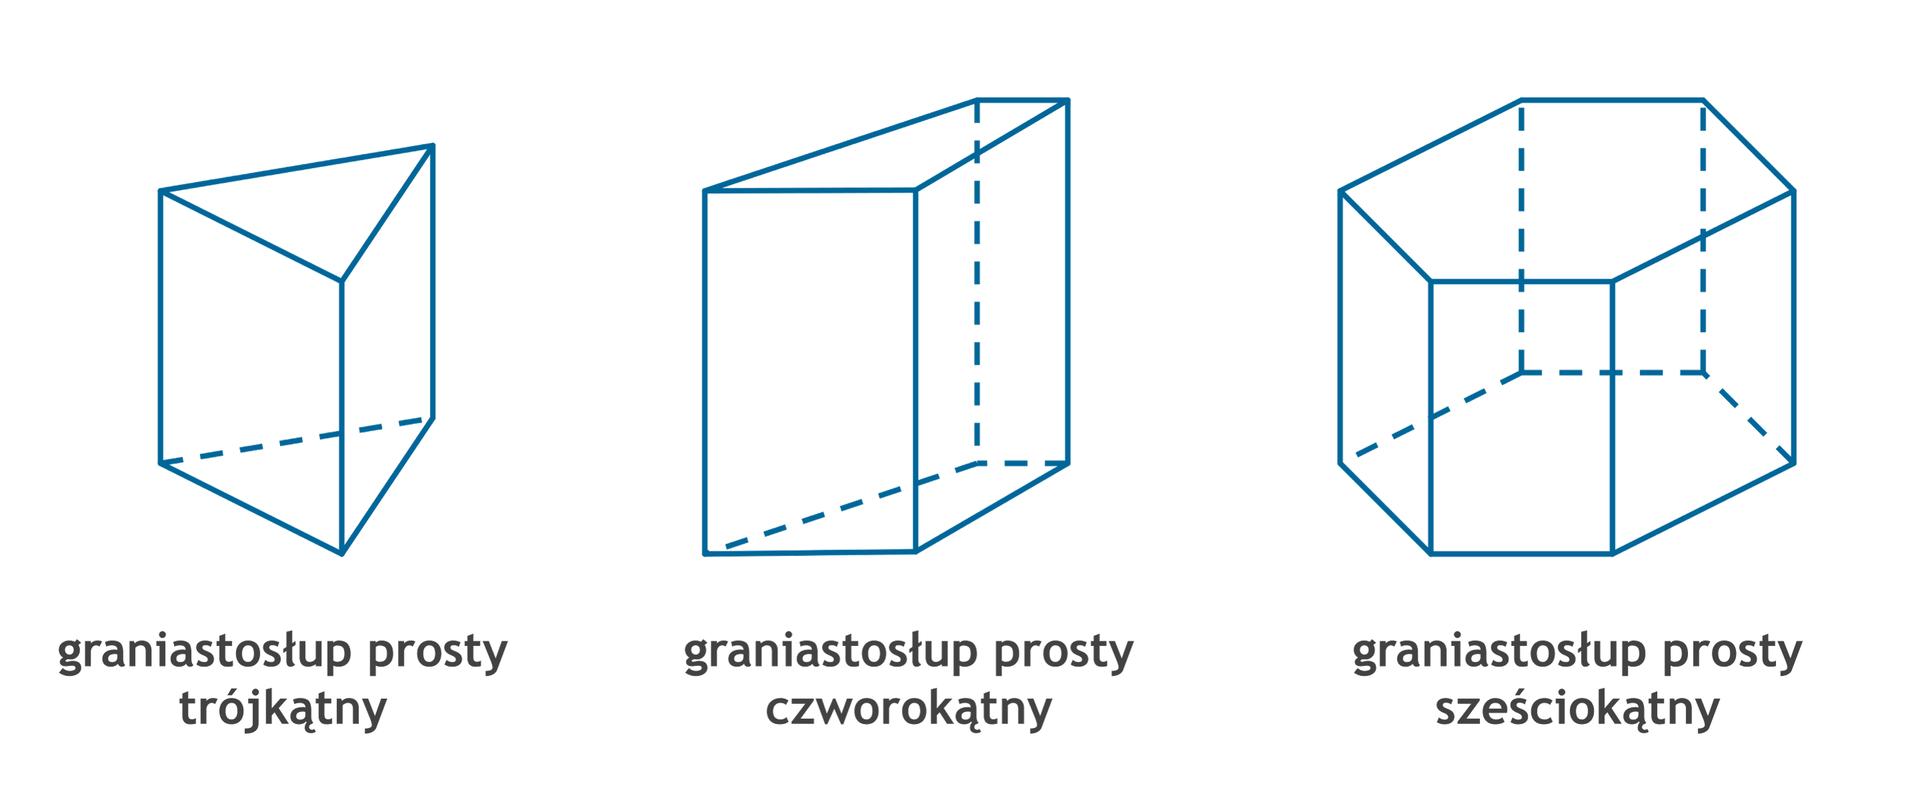 Rysunek graniastosłupa prostego trójkątnego, graniastosłupa prostego czworokątnego igraniastosłupa prostego sześciokątnego.